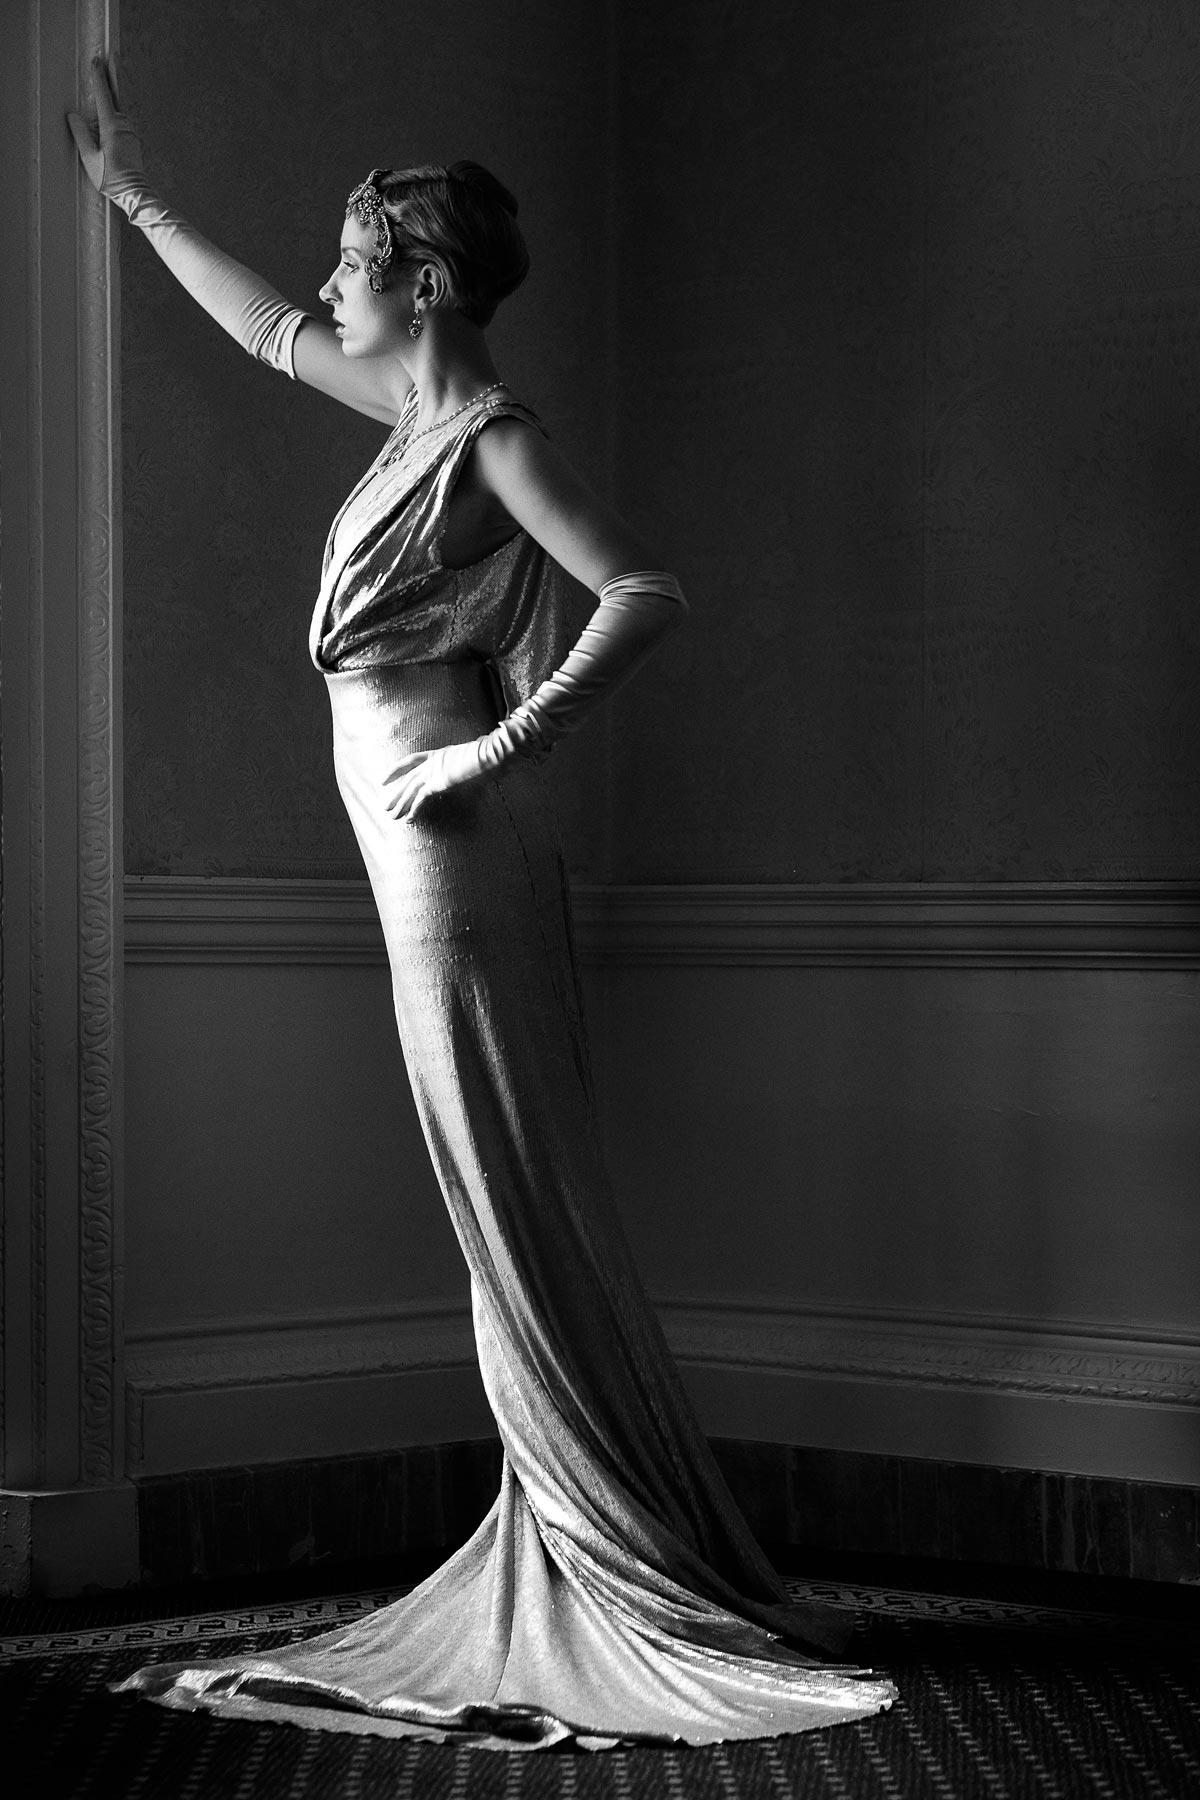 Mina Renoir at Clifton Hill House - Monochrome